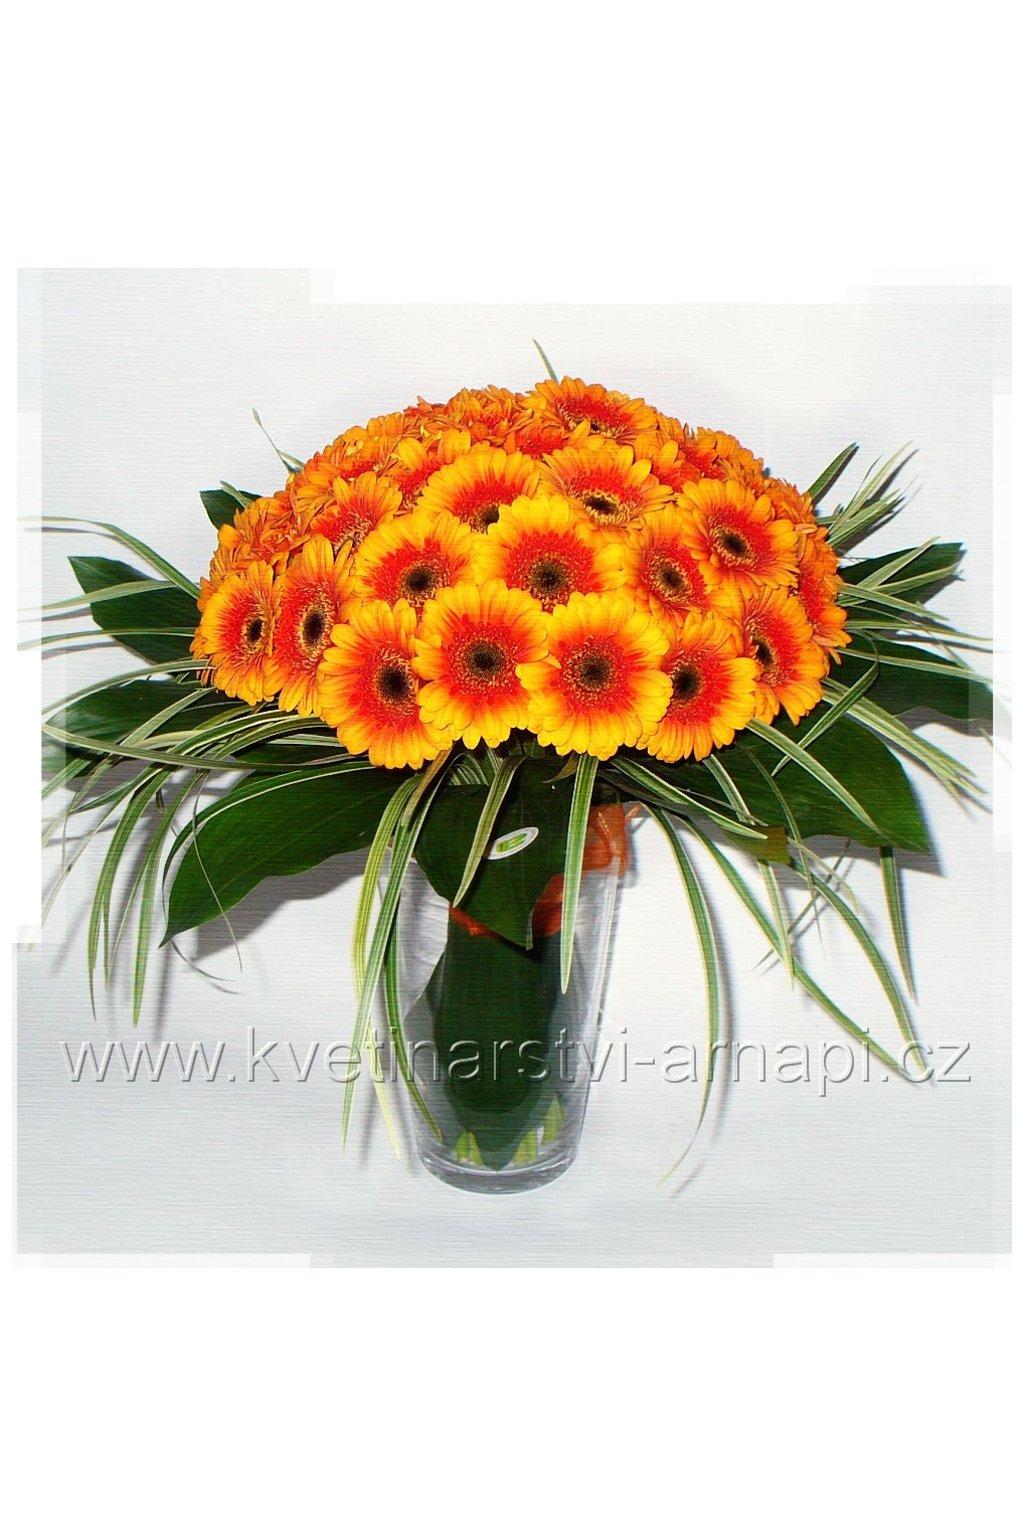 kytice kvetiny darky online prodej kvetinarstvi arnapi